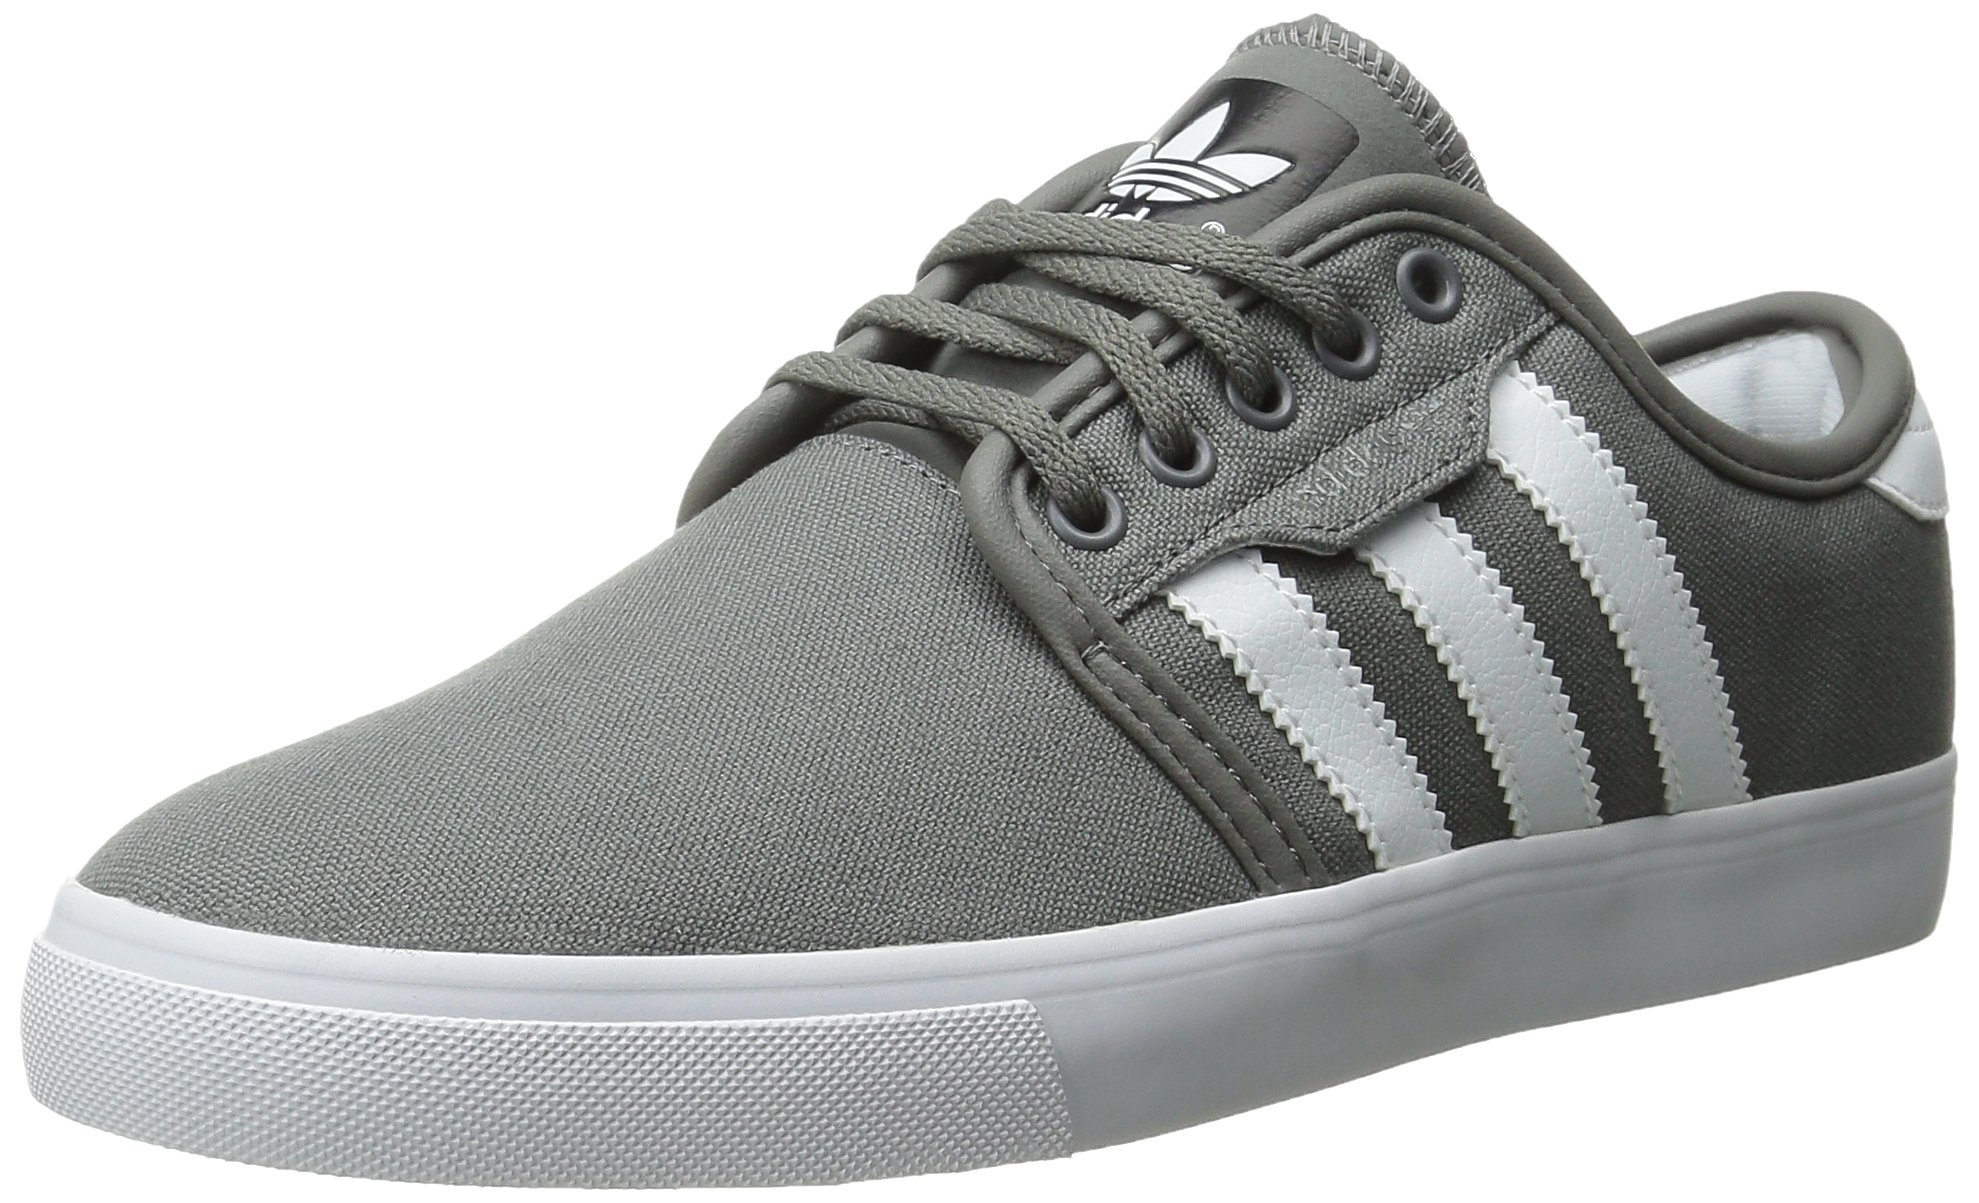 size 40 33fa4 1ed39 adidas Originals Men's Seeley Lace Up Shoe | EVRYBASE